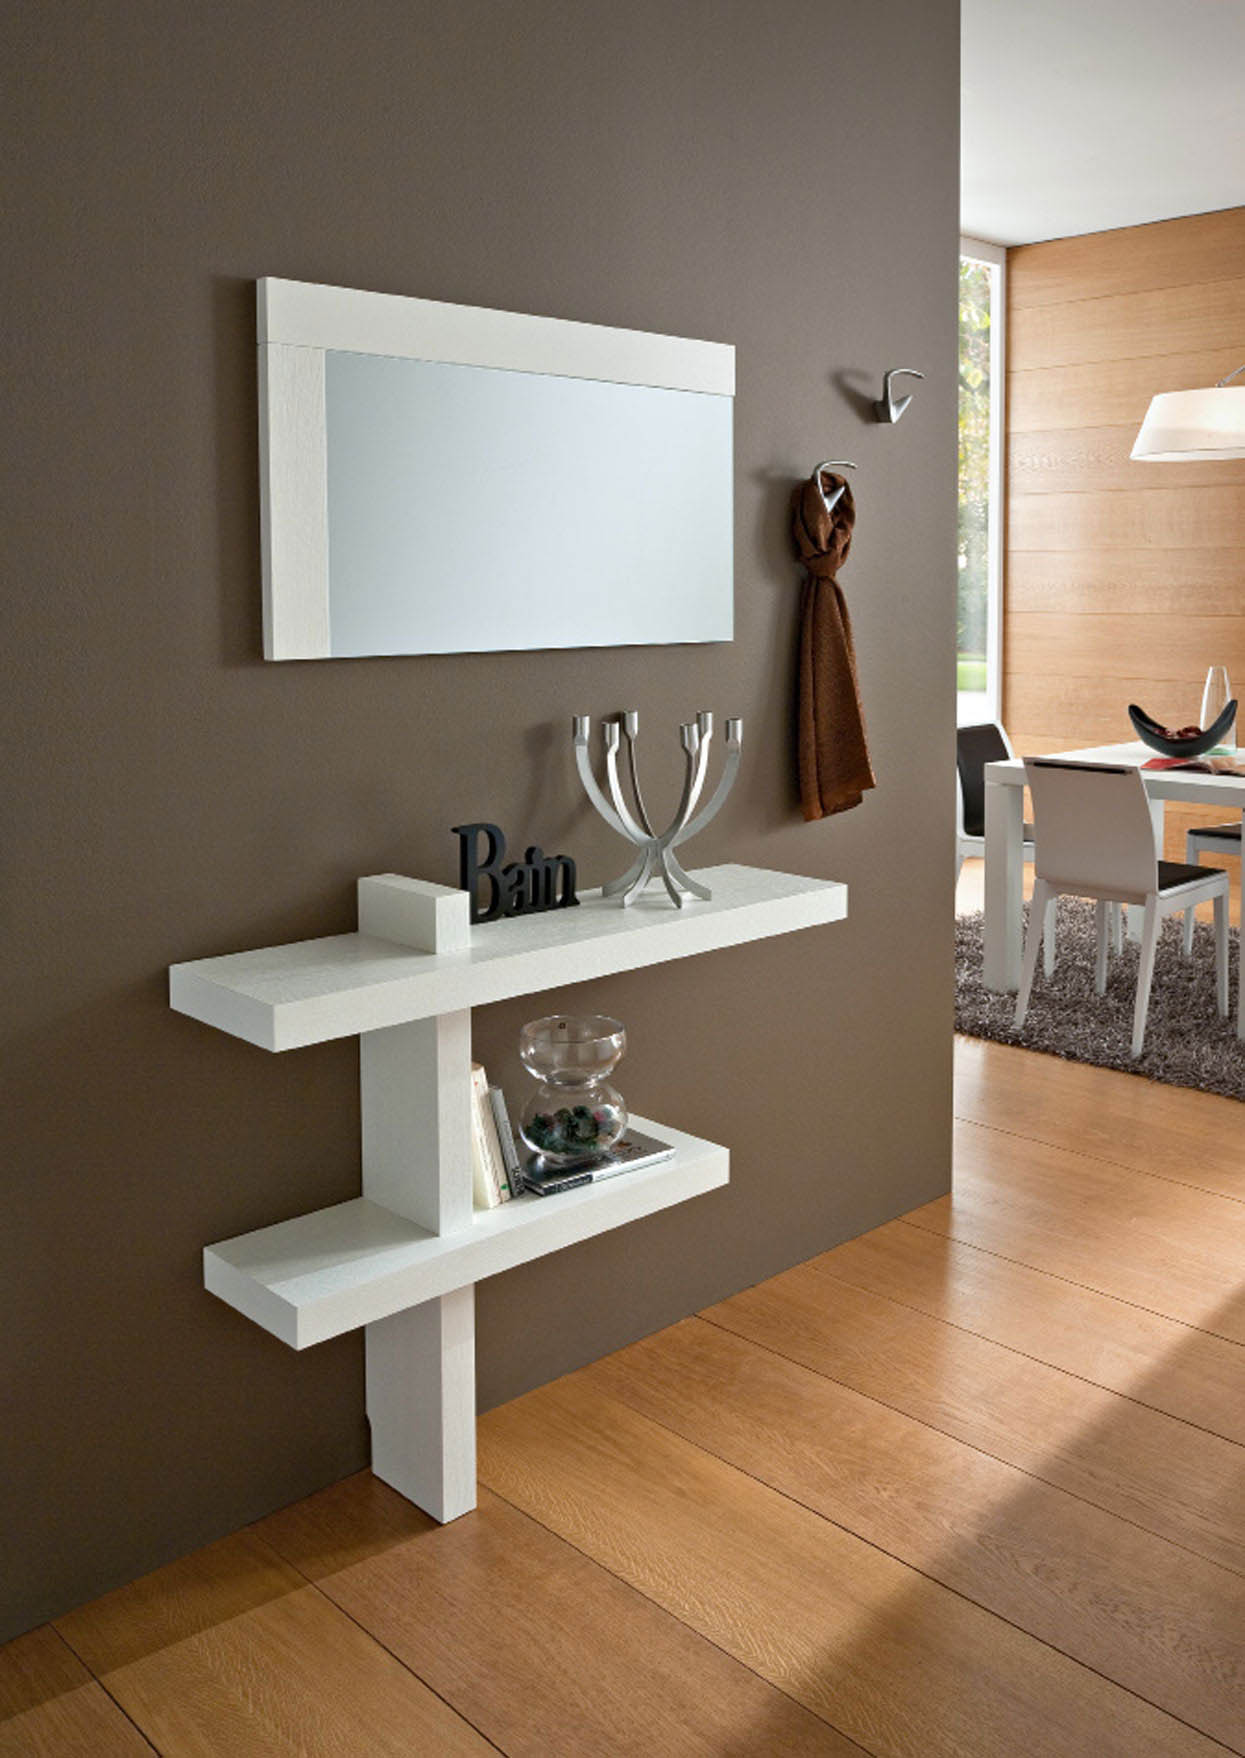 Mobile ingresso console bianco lucido o frassino sandy ebay for Mobile ingresso